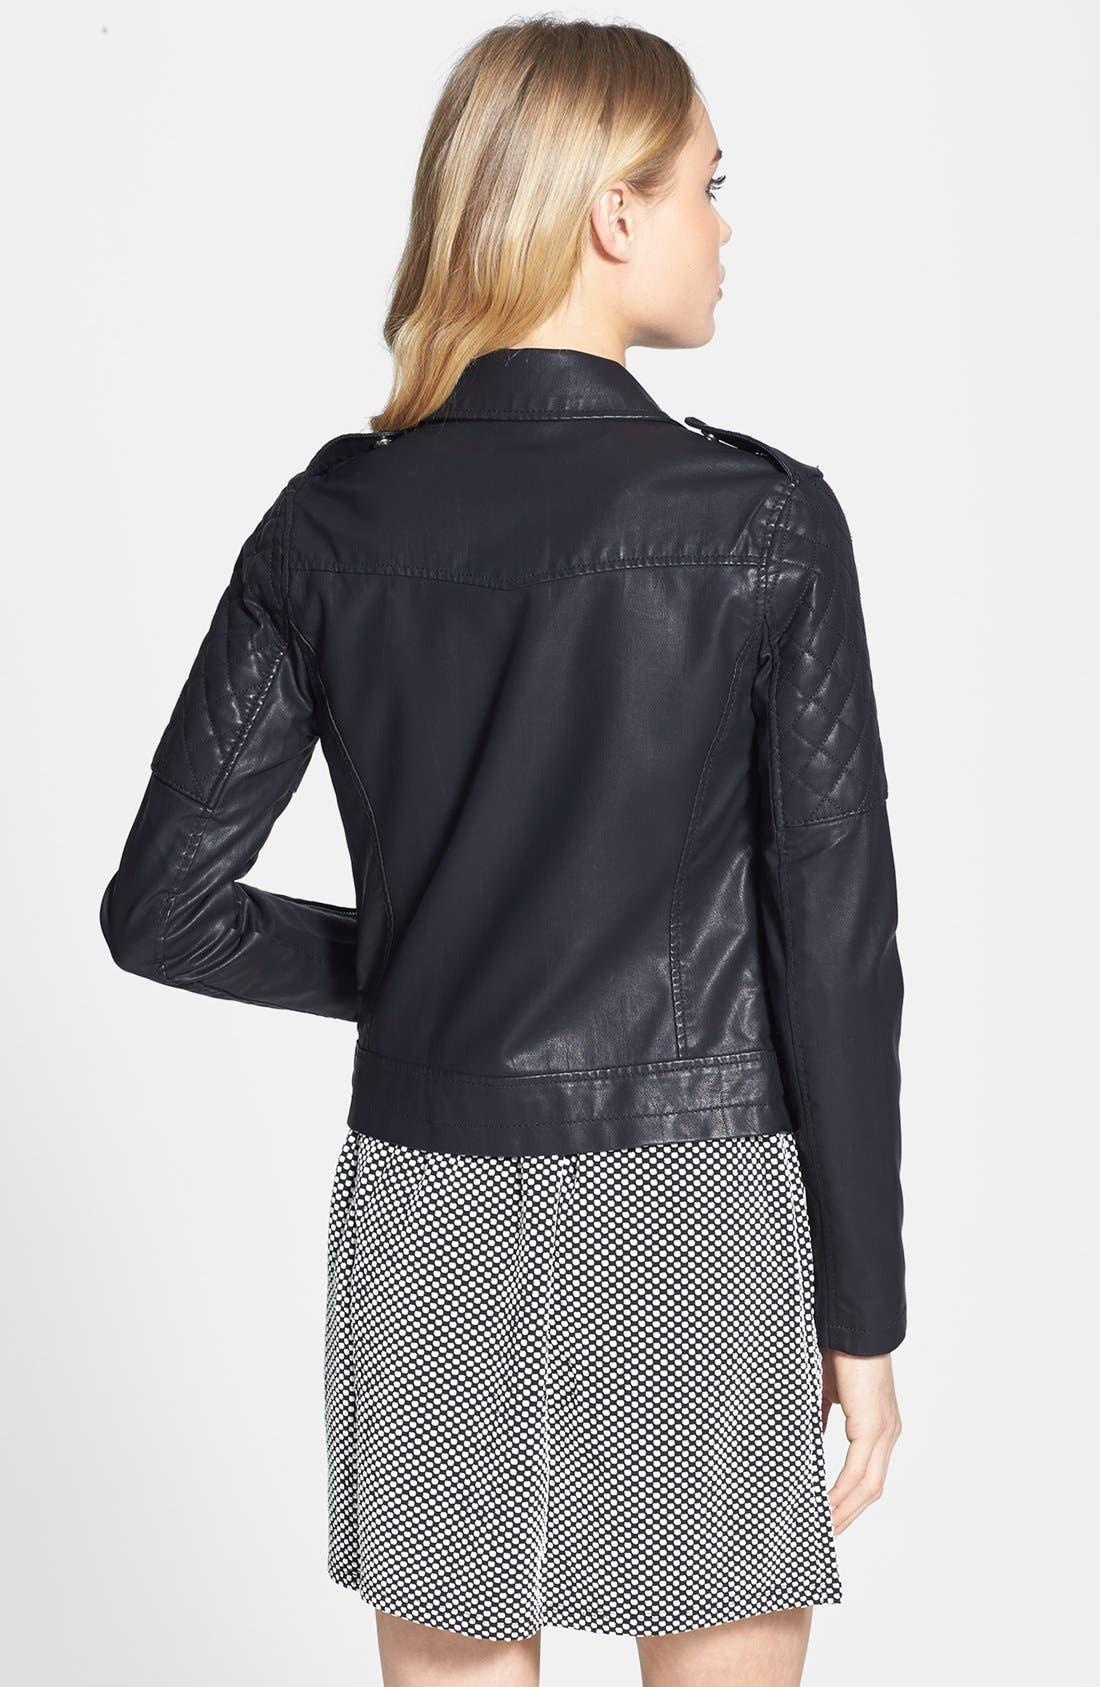 TOPSHOP, 'Wylde' Faux Leather Biker Jacket, Alternate thumbnail 2, color, 001